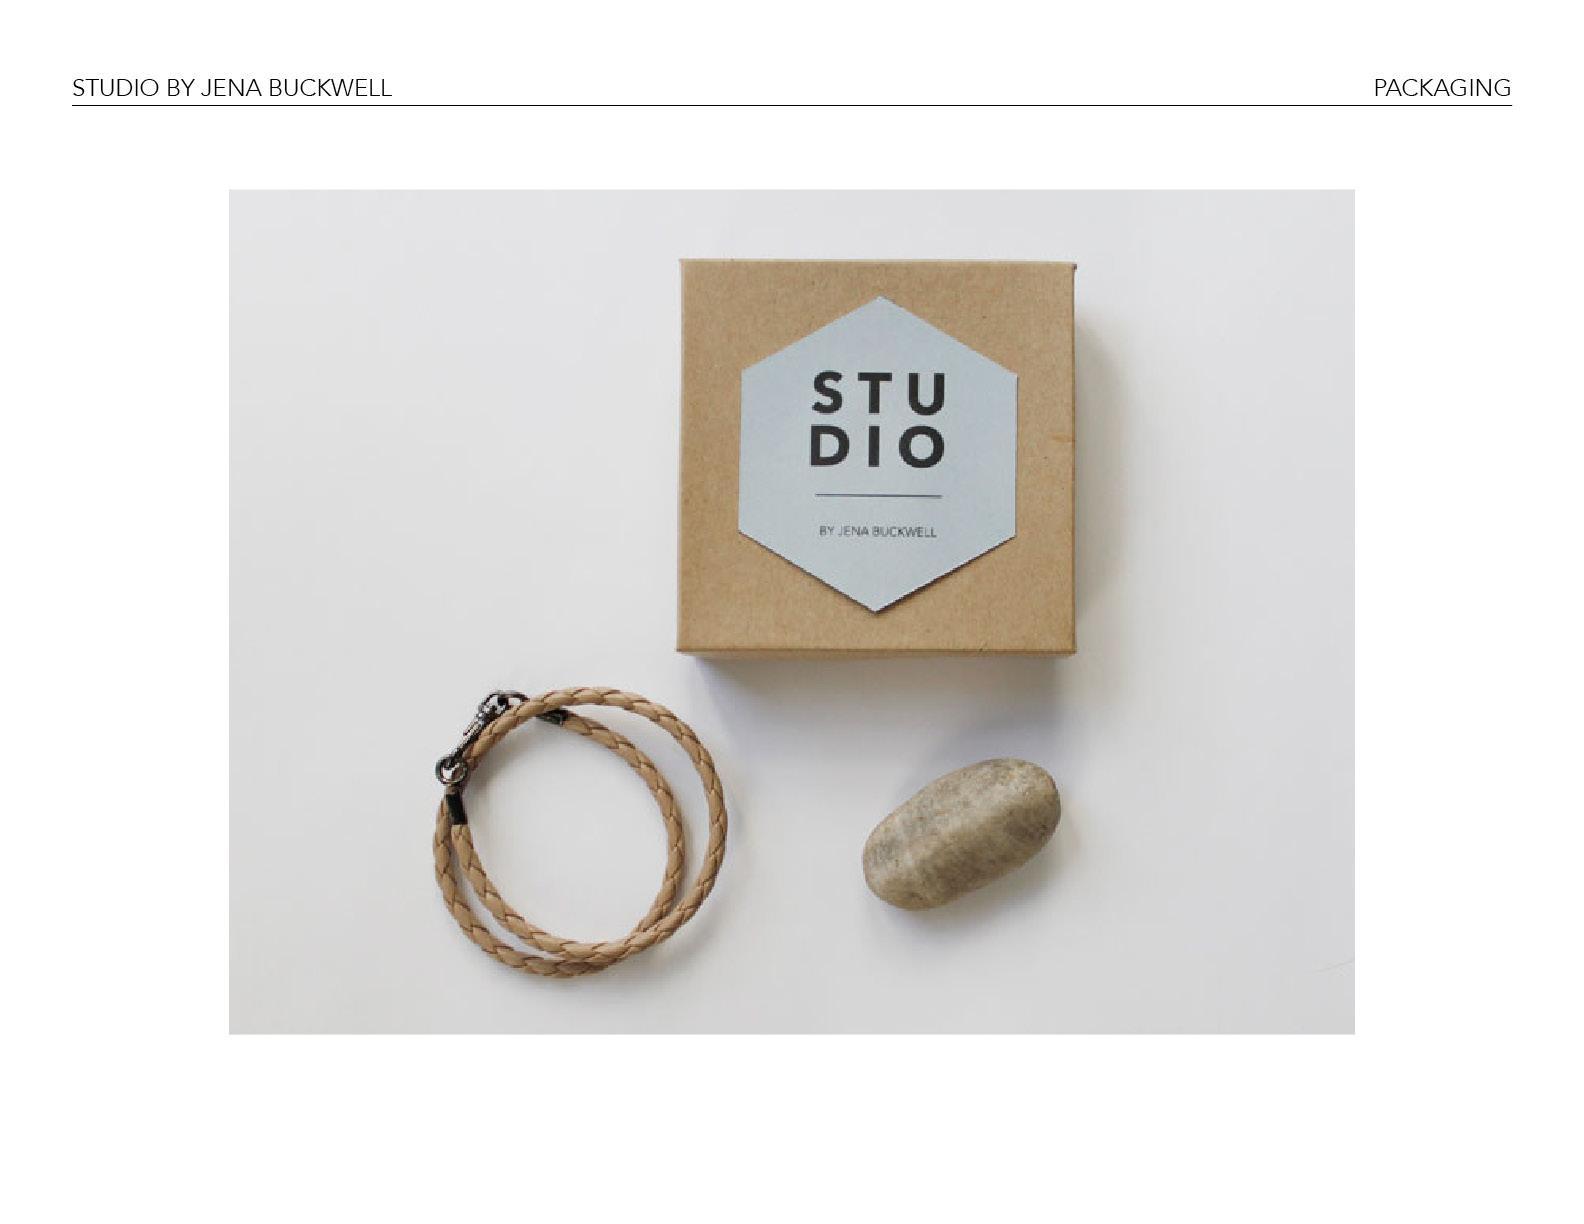 Studio, by Jena Buckwell - image 13 - student project